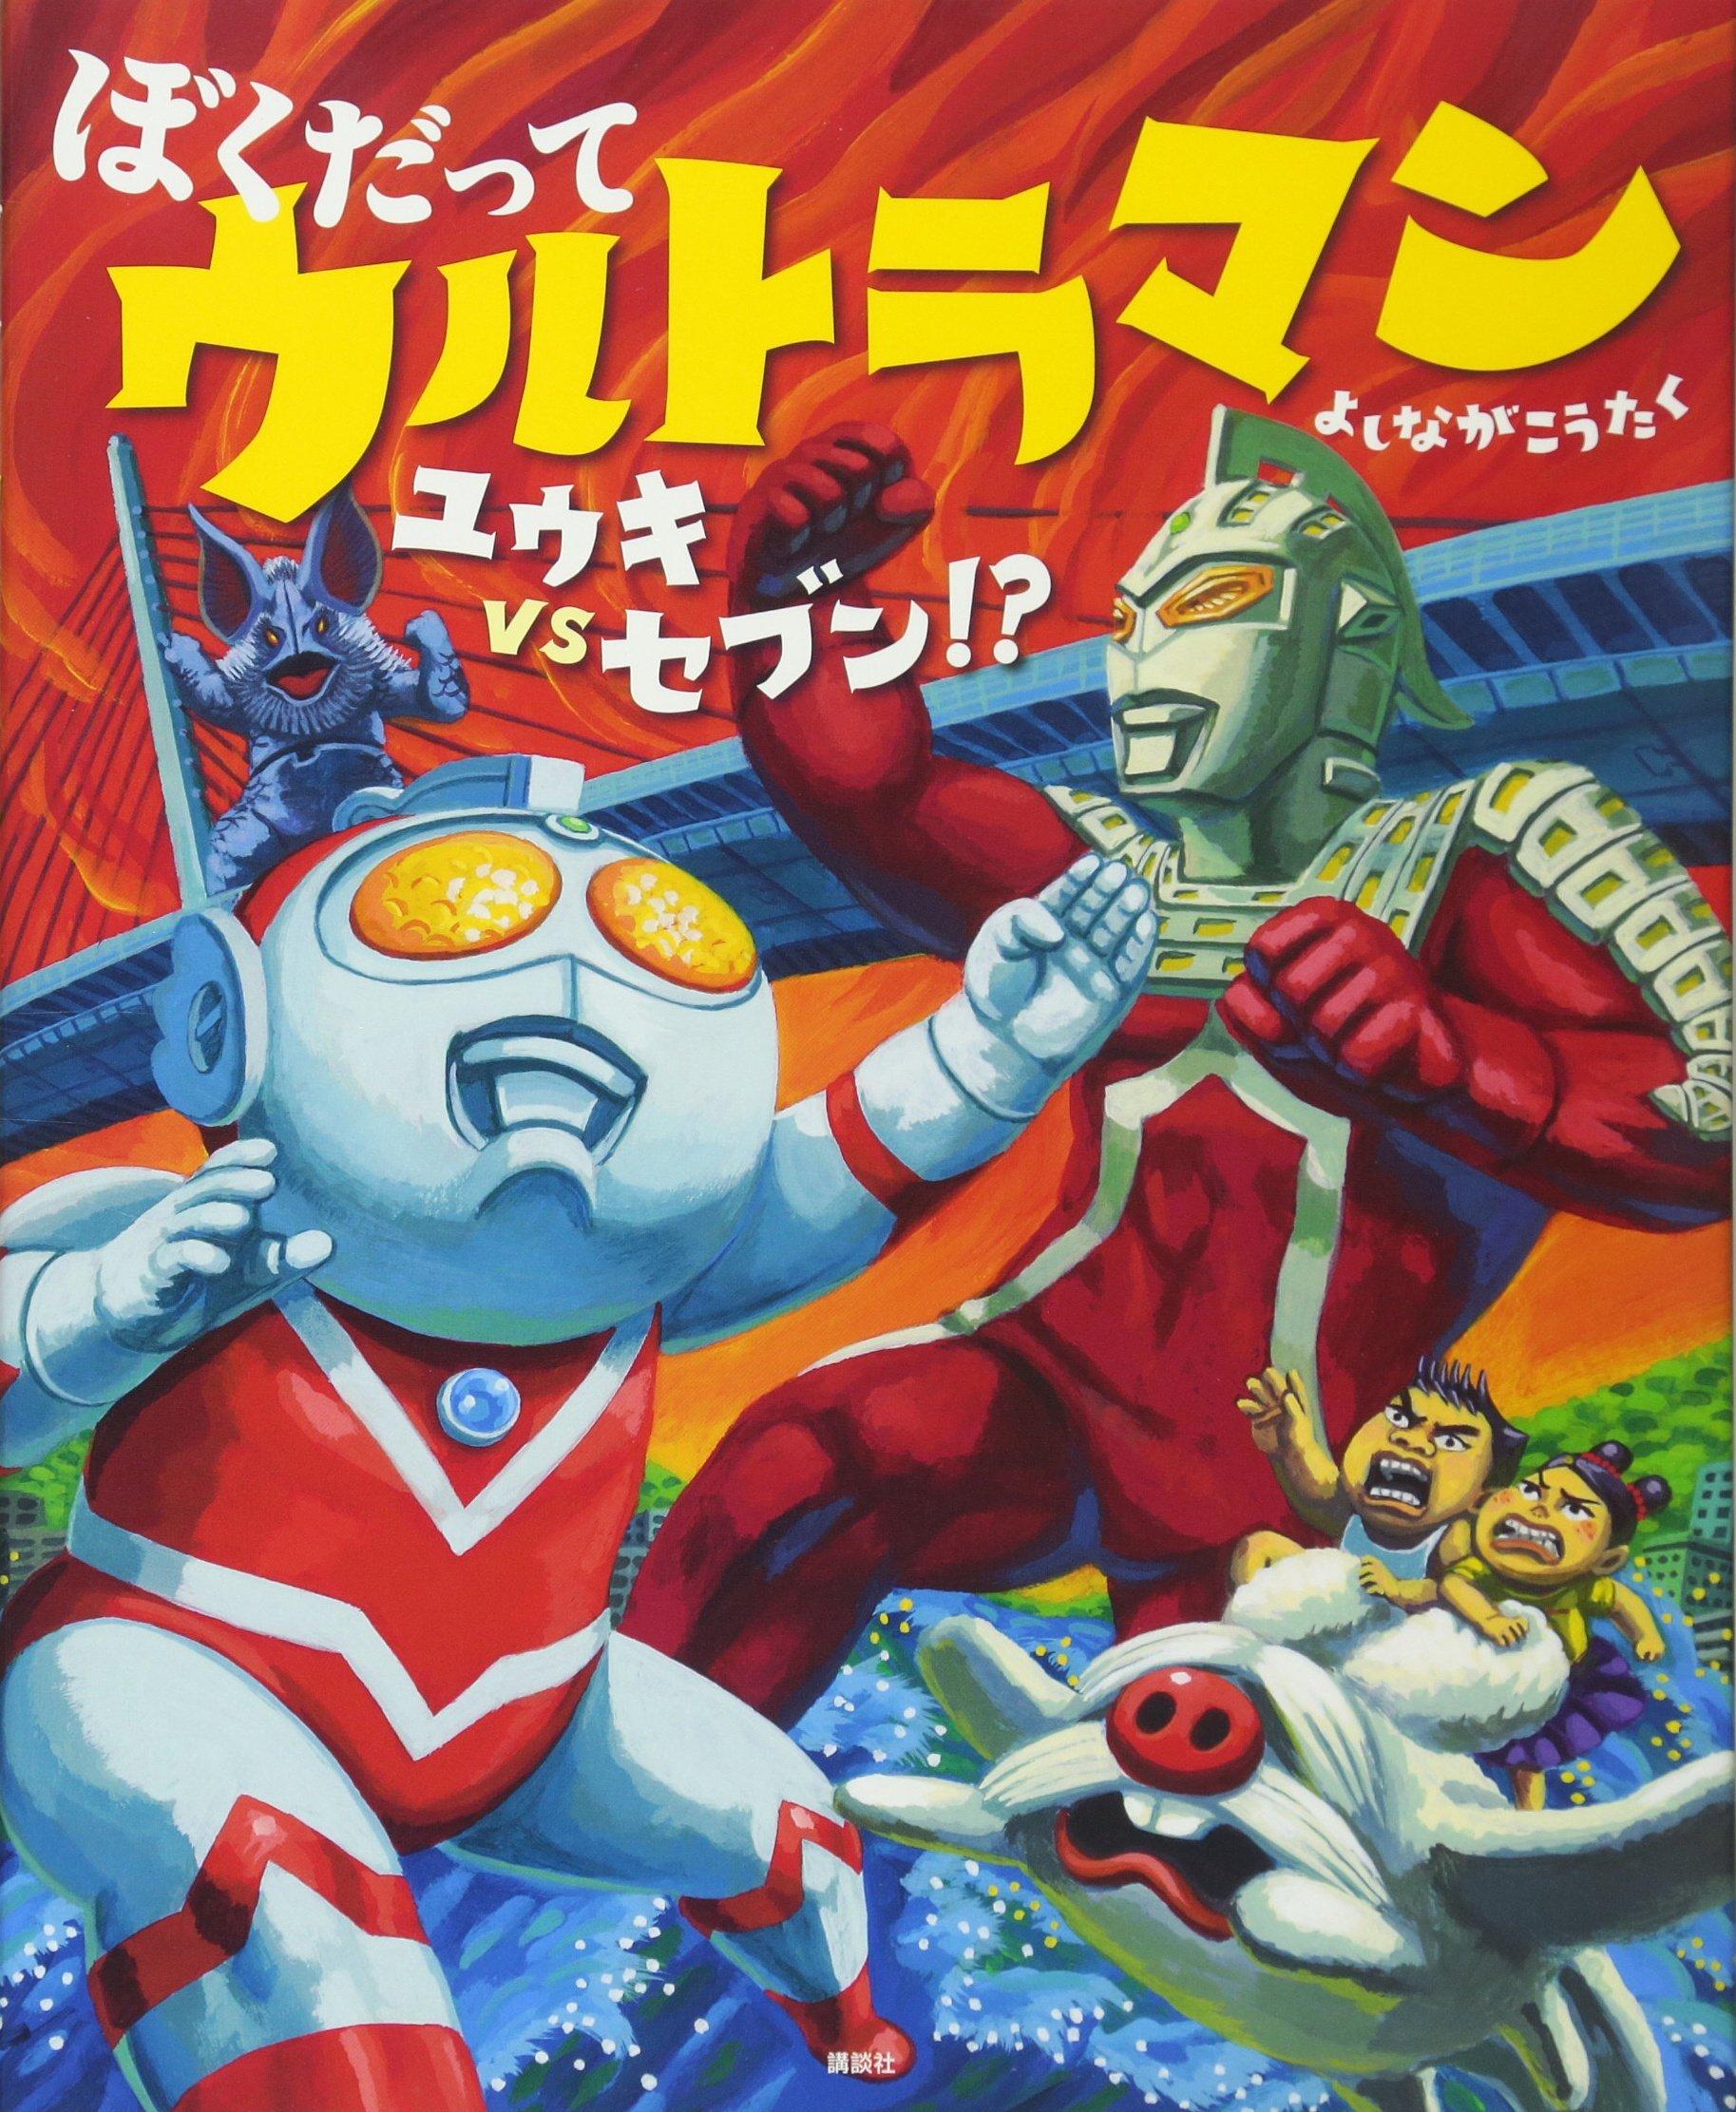 Read Online I even Ultraman yuuki VS seven! (Kodansha Ltd., creative children's books) ebook